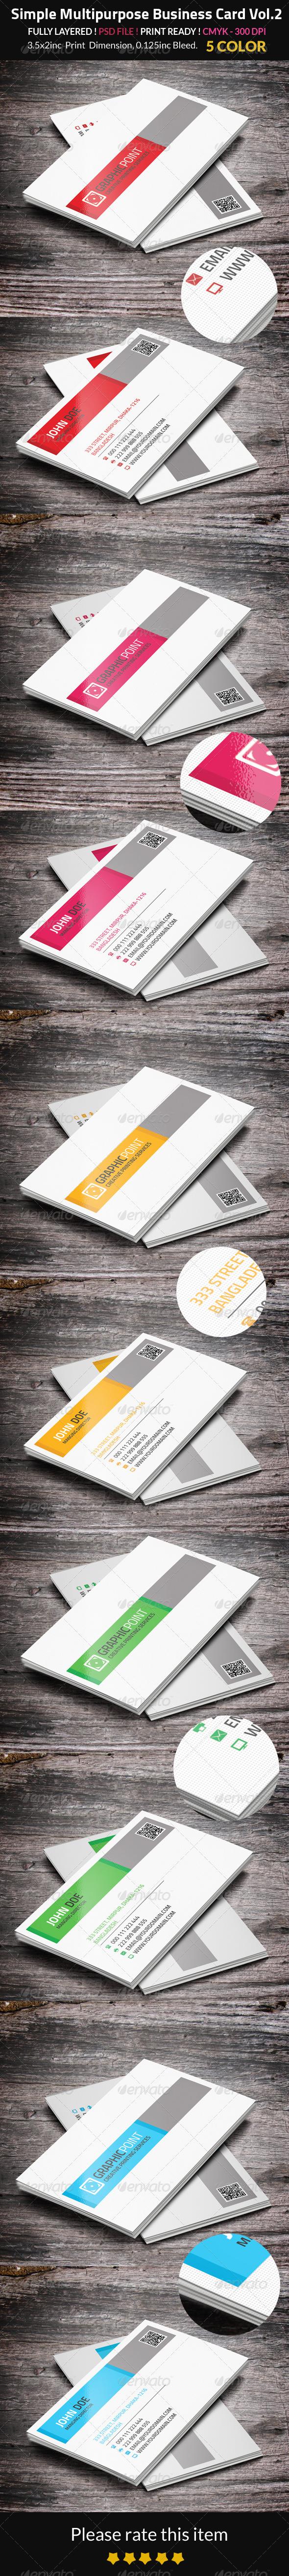 Simple Multipurpose Business Card Vol.2